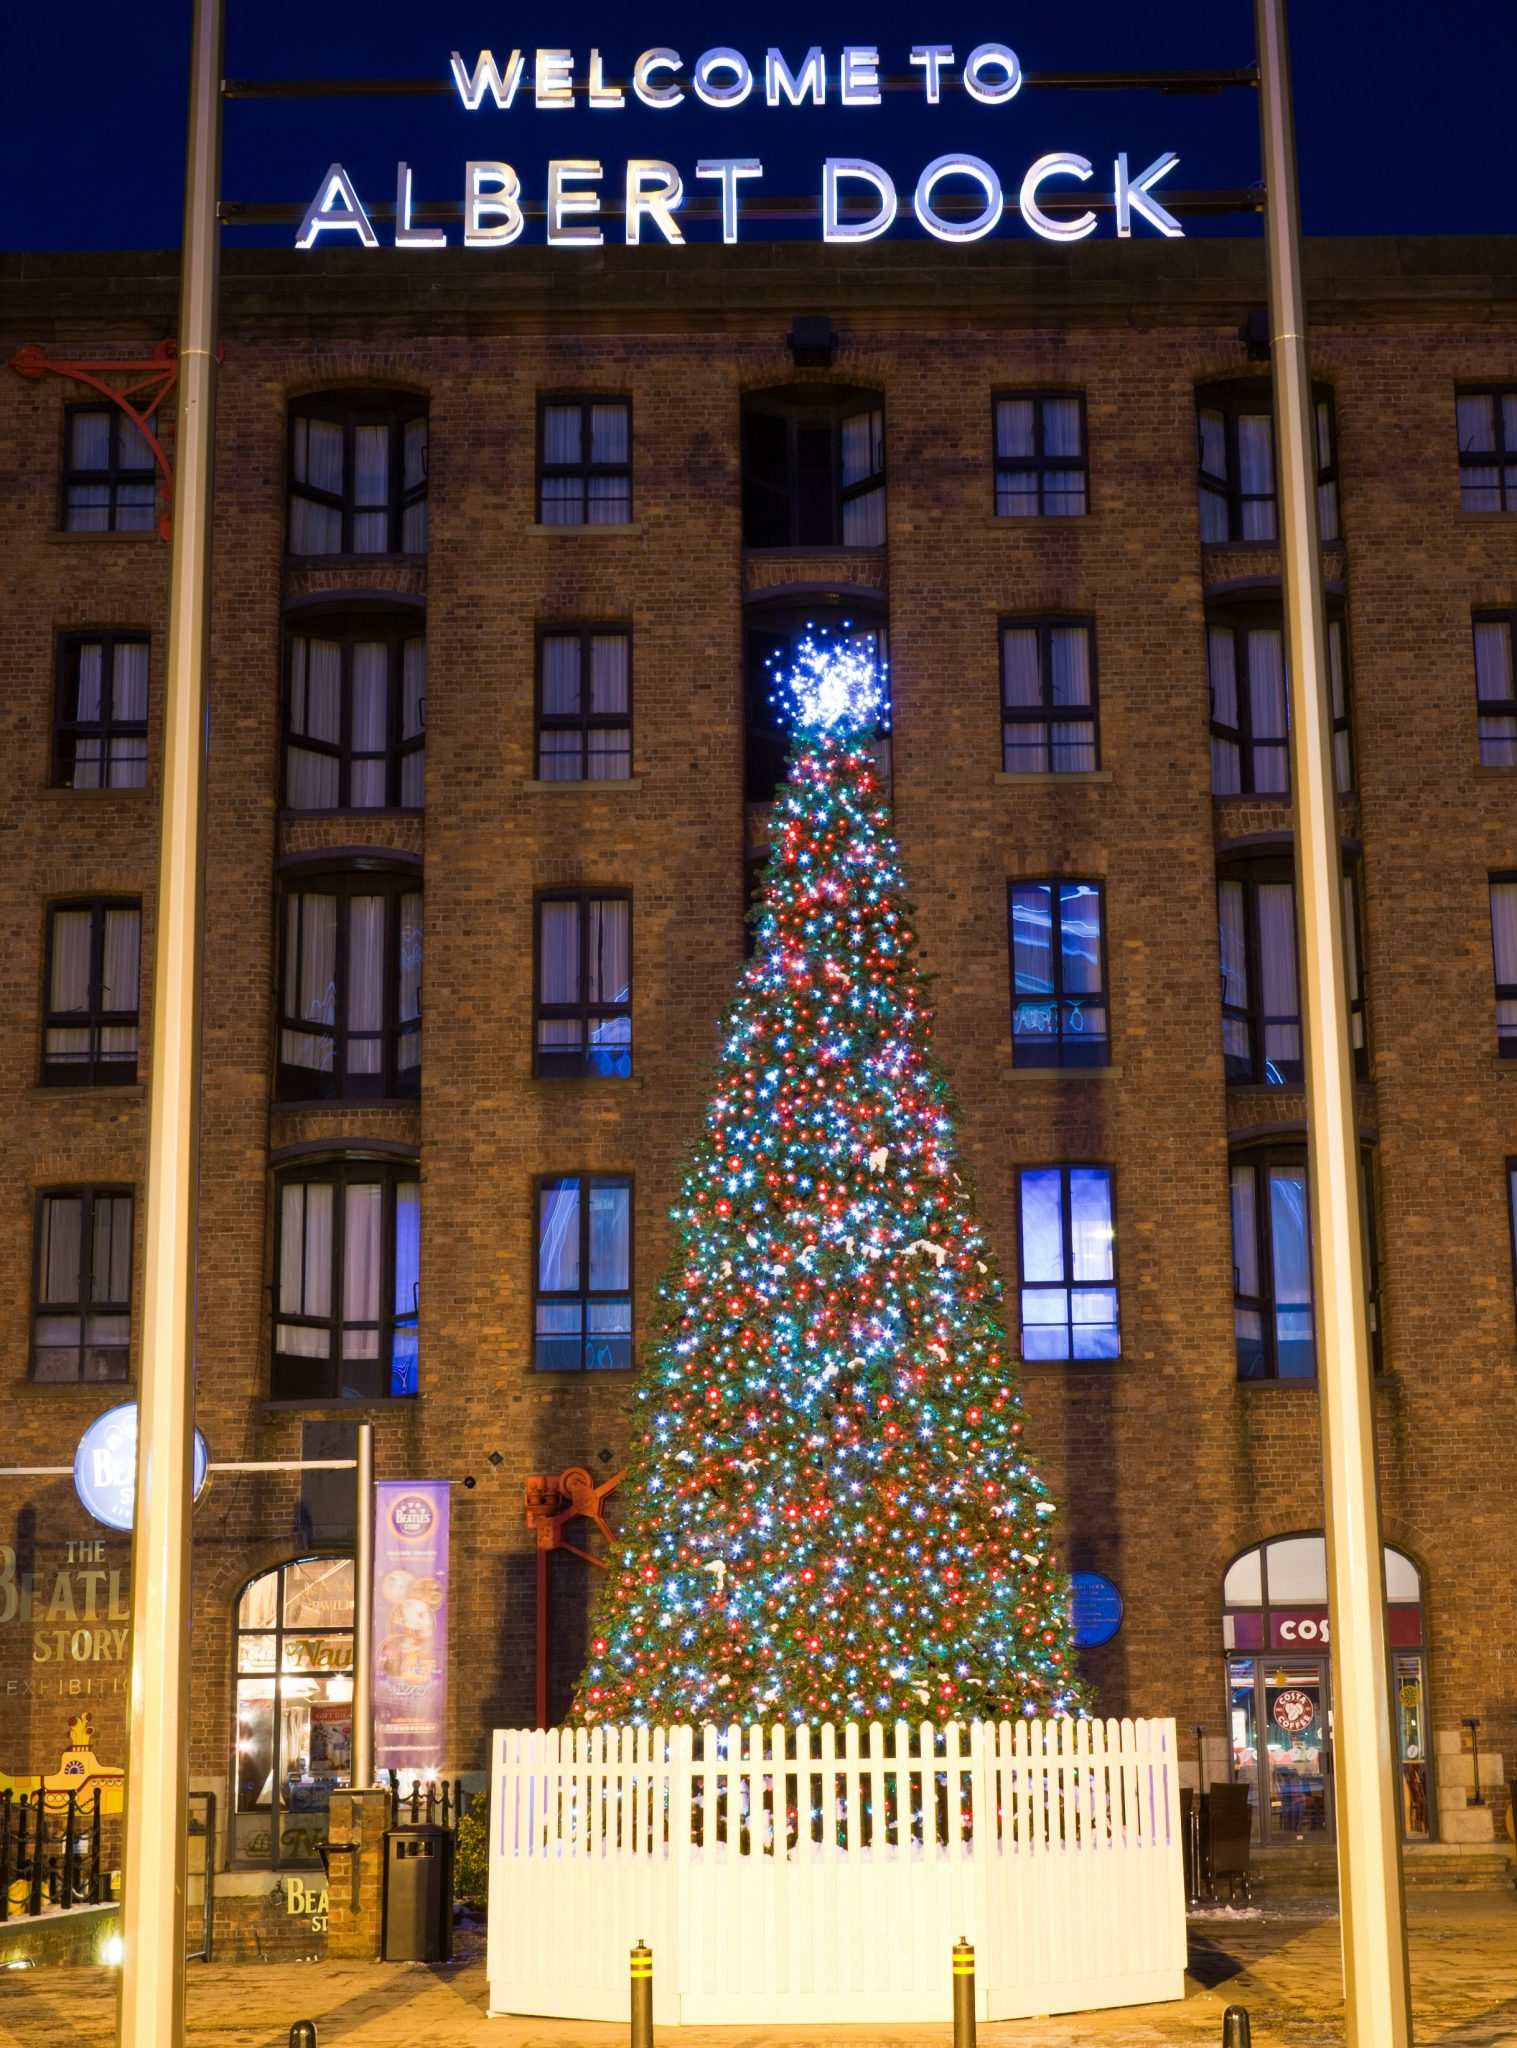 Albert Dock Christmas giant Christmas tee